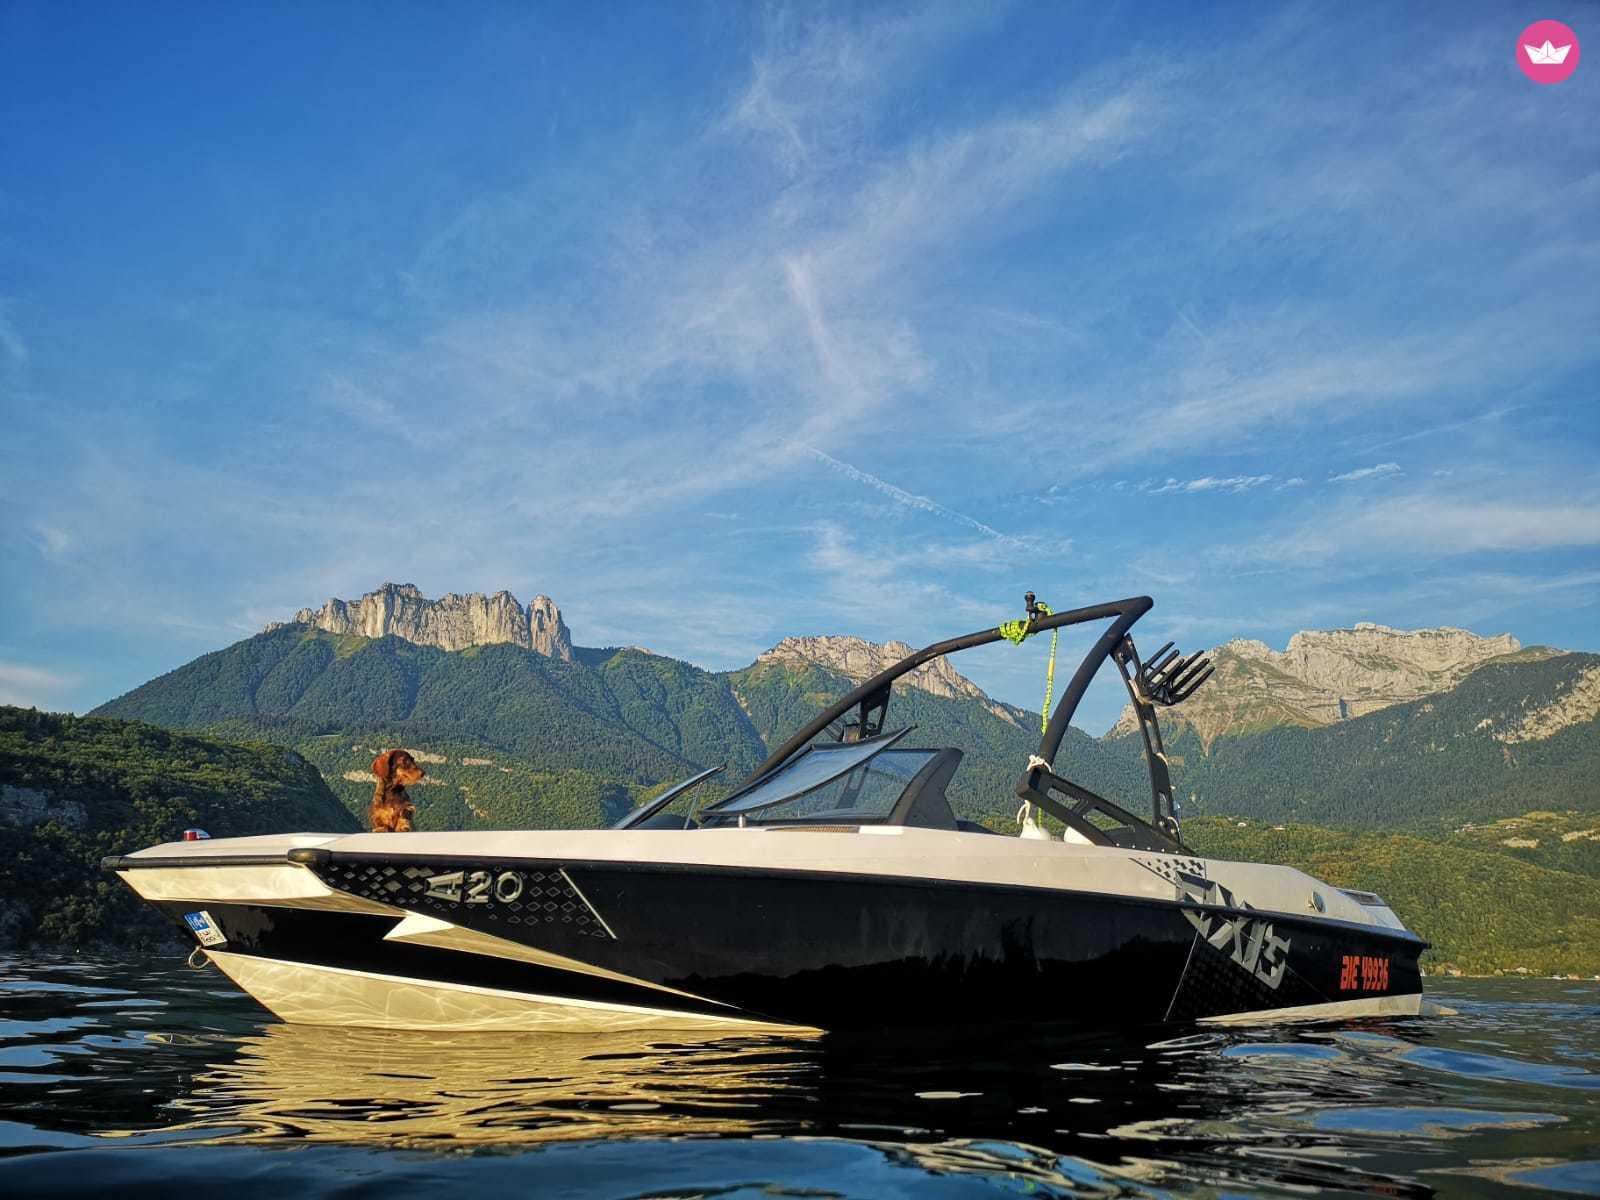 Malibu Axis A20 Wakeboard / Wakesurf Boat